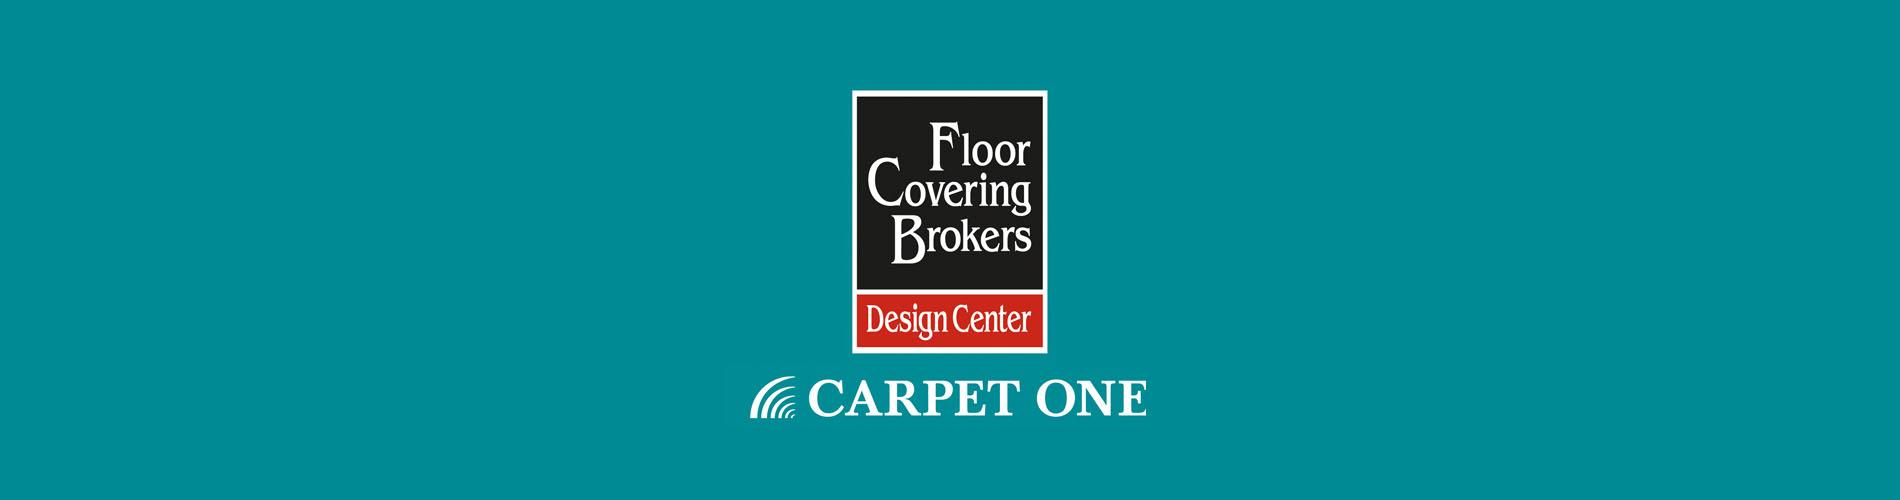 Shop Carpet & Flooring at Floor Covering Brokers Carpet One.